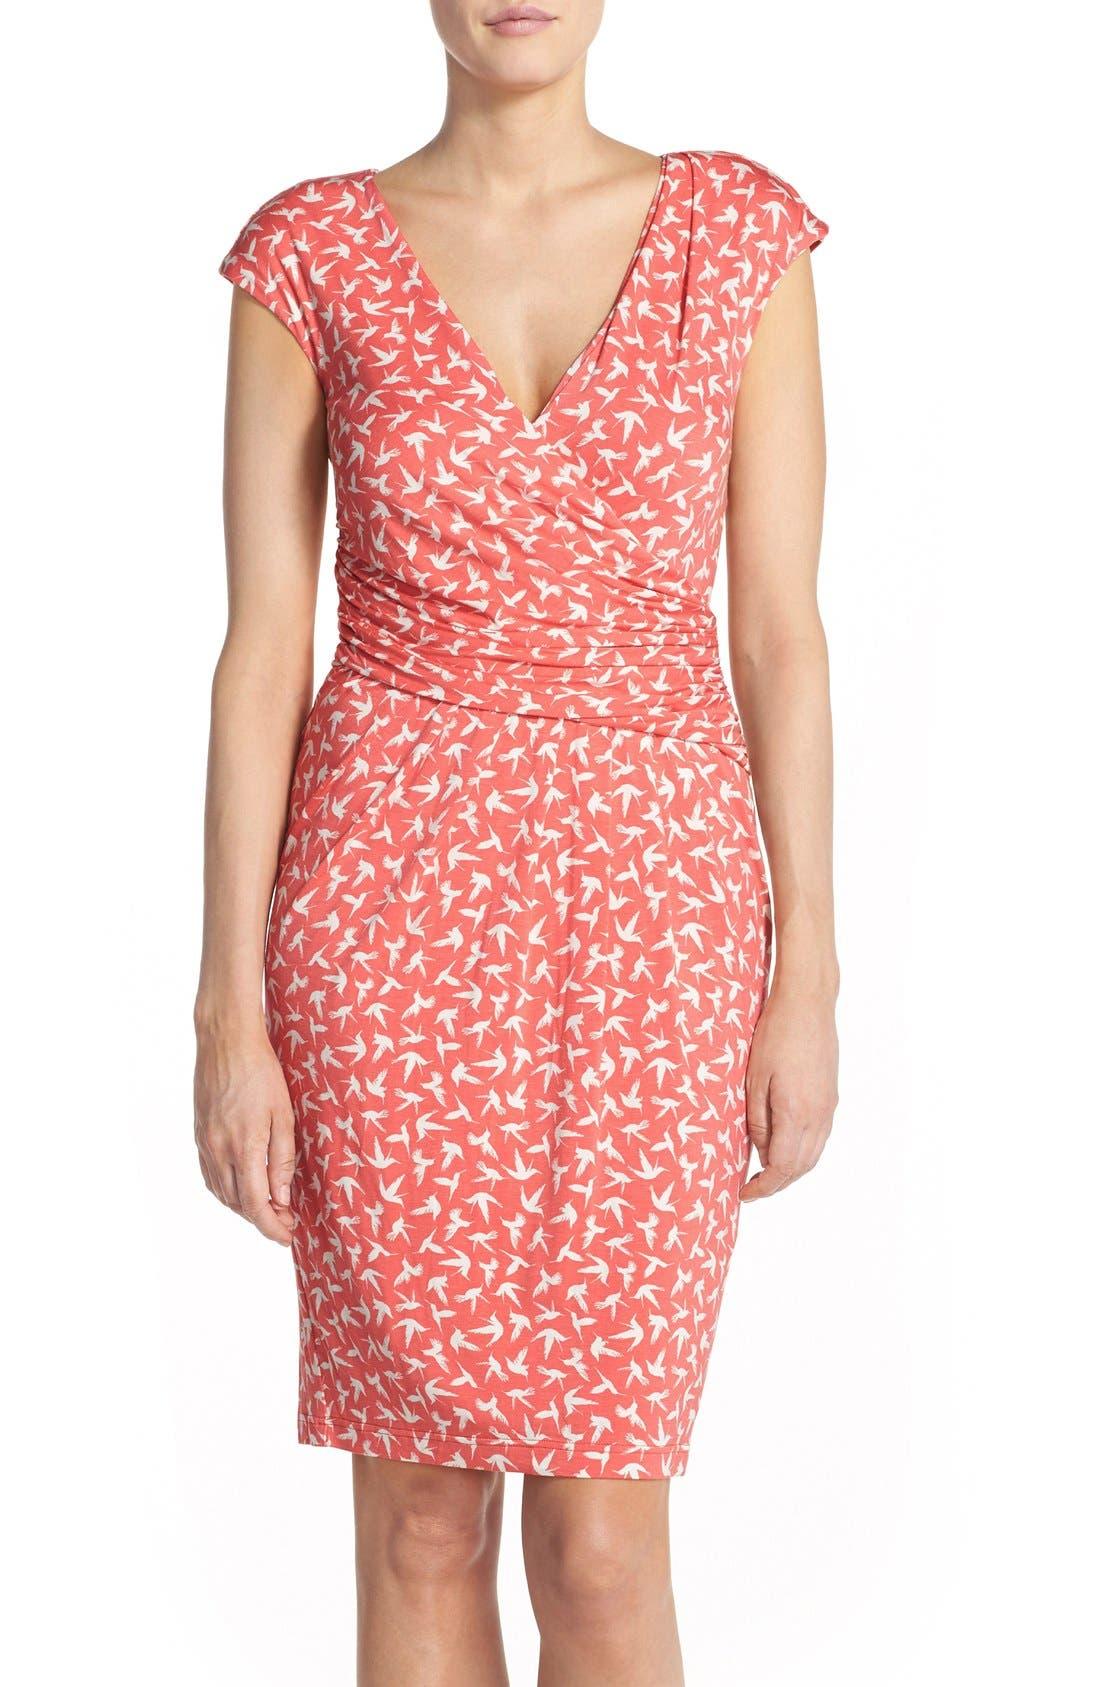 Alternate Image 1 Selected - Adrianna Papell Bird Print Knit Sheath Dress